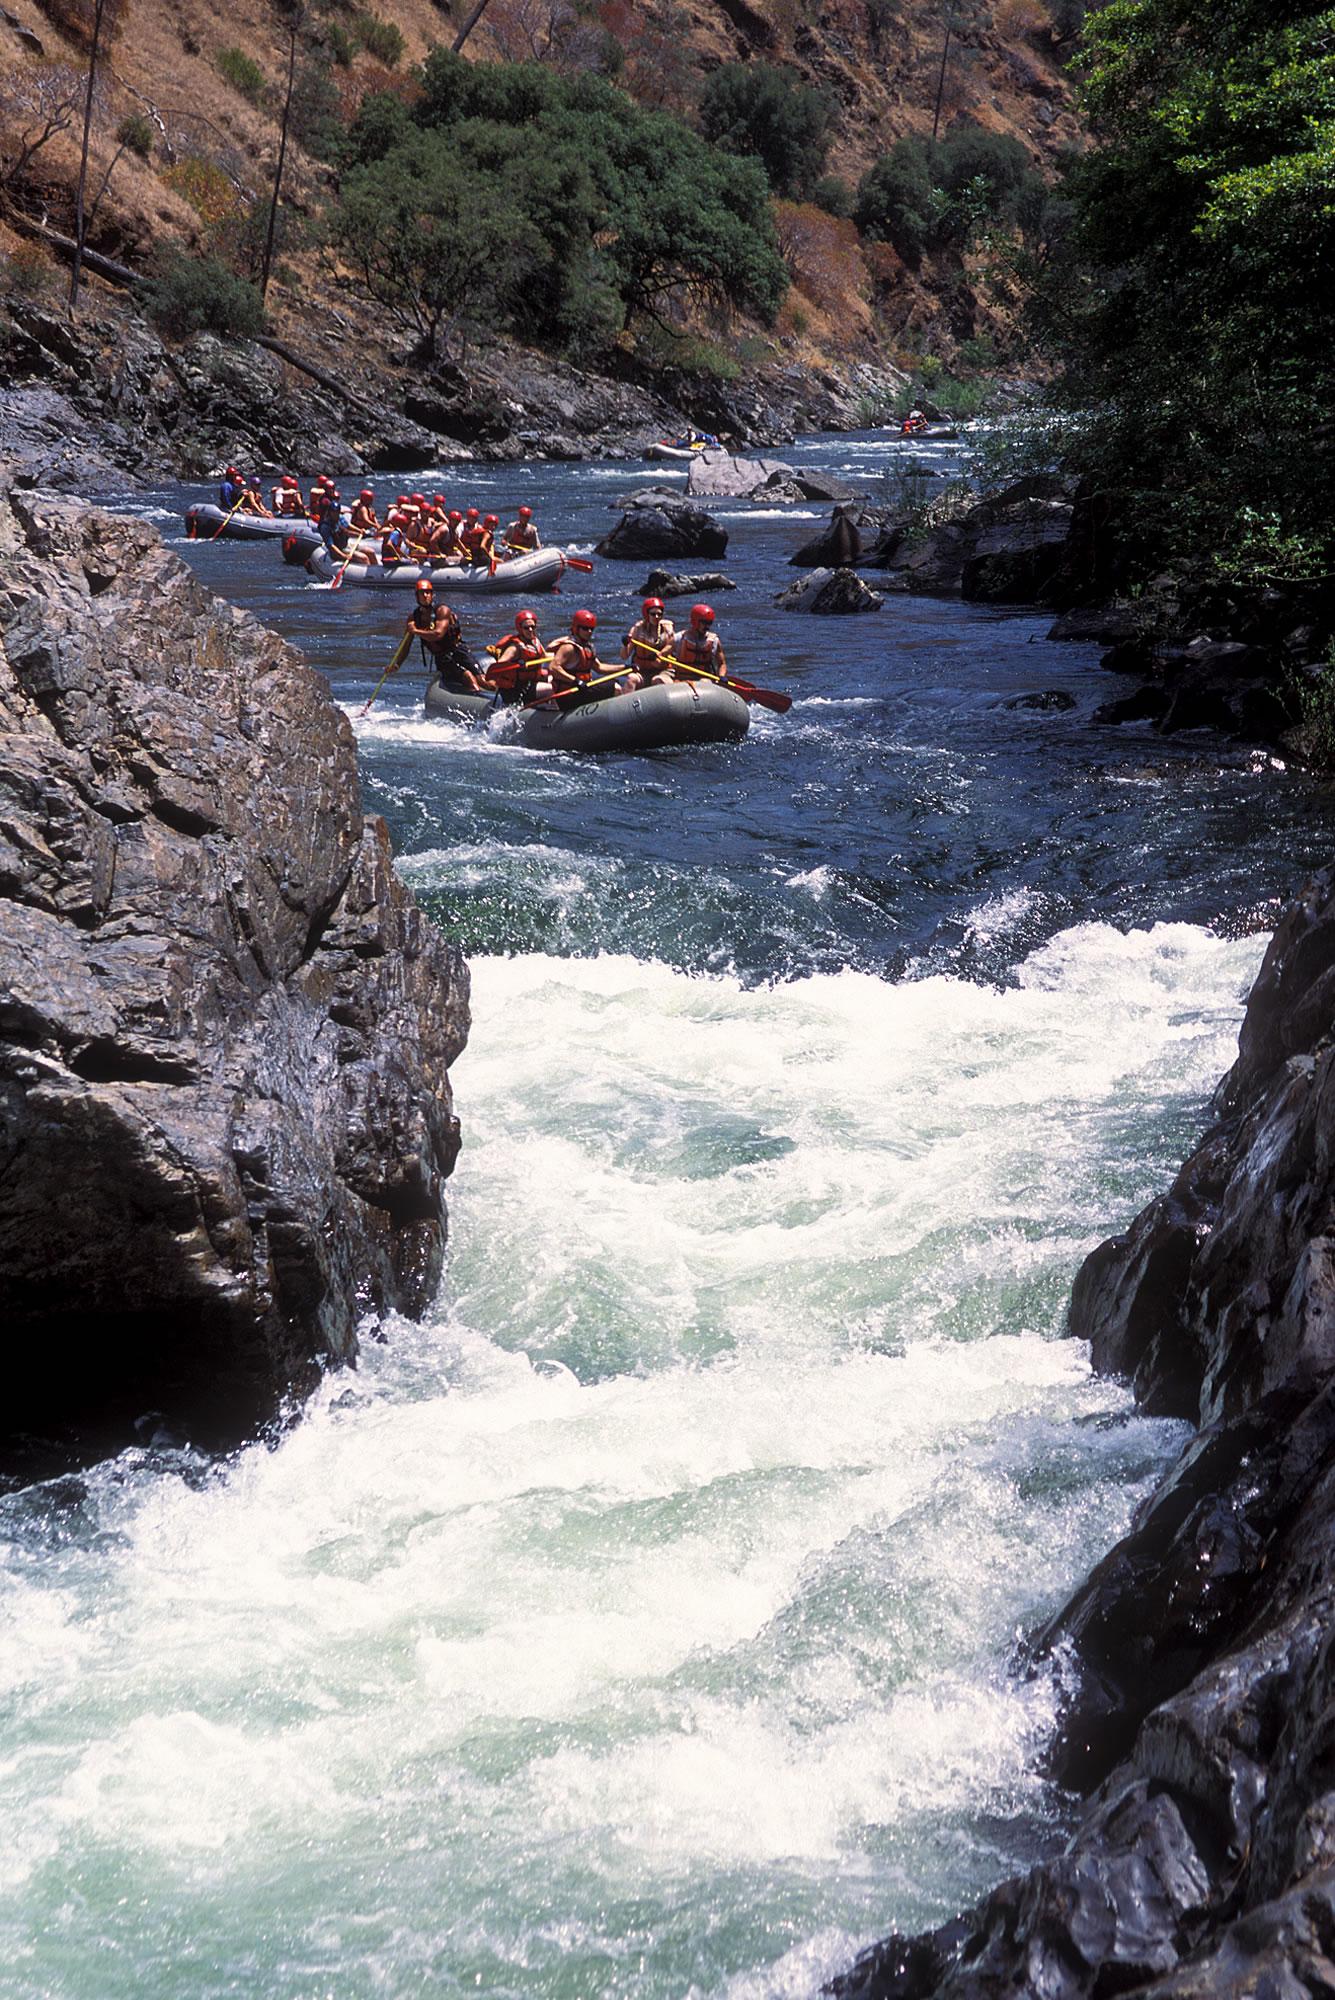 Tuolumne River Rafting Trips